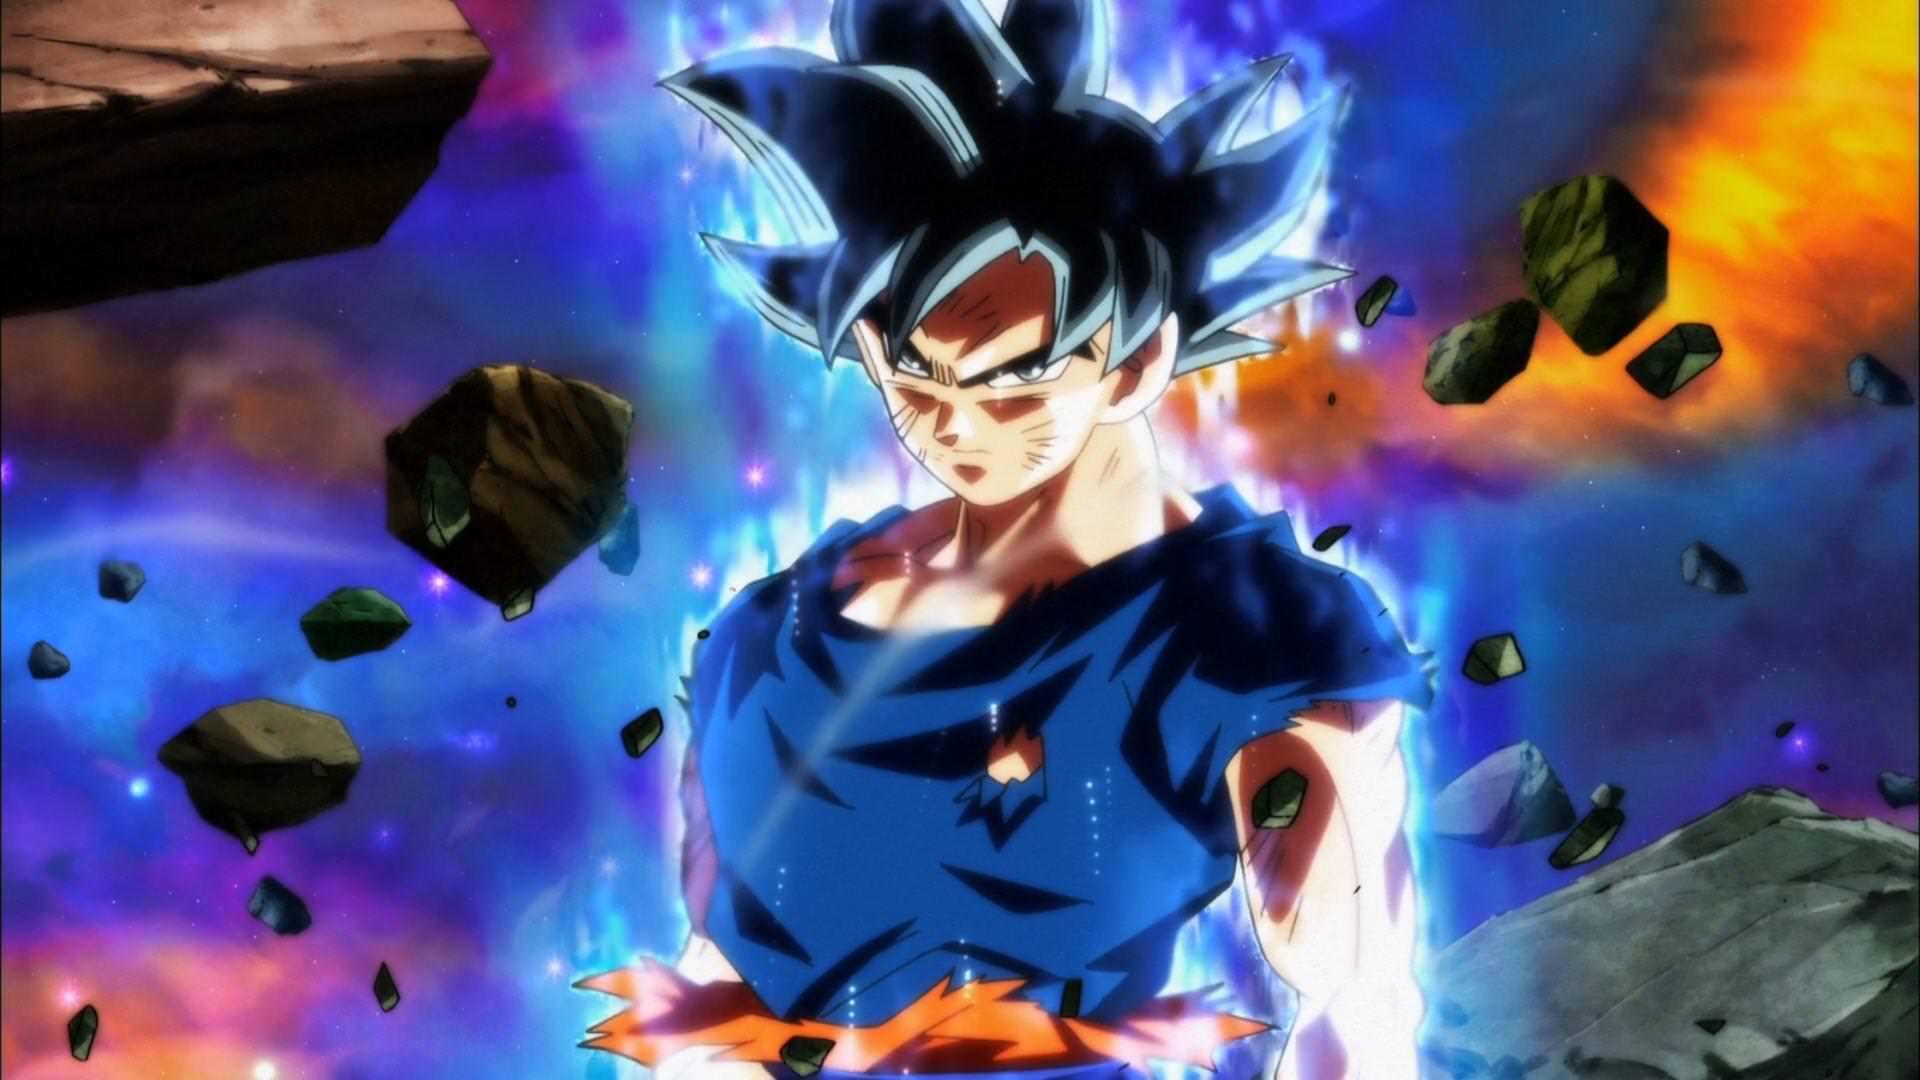 Dragon Ball Super La Serie Completa Tendrá 10 Boxes En